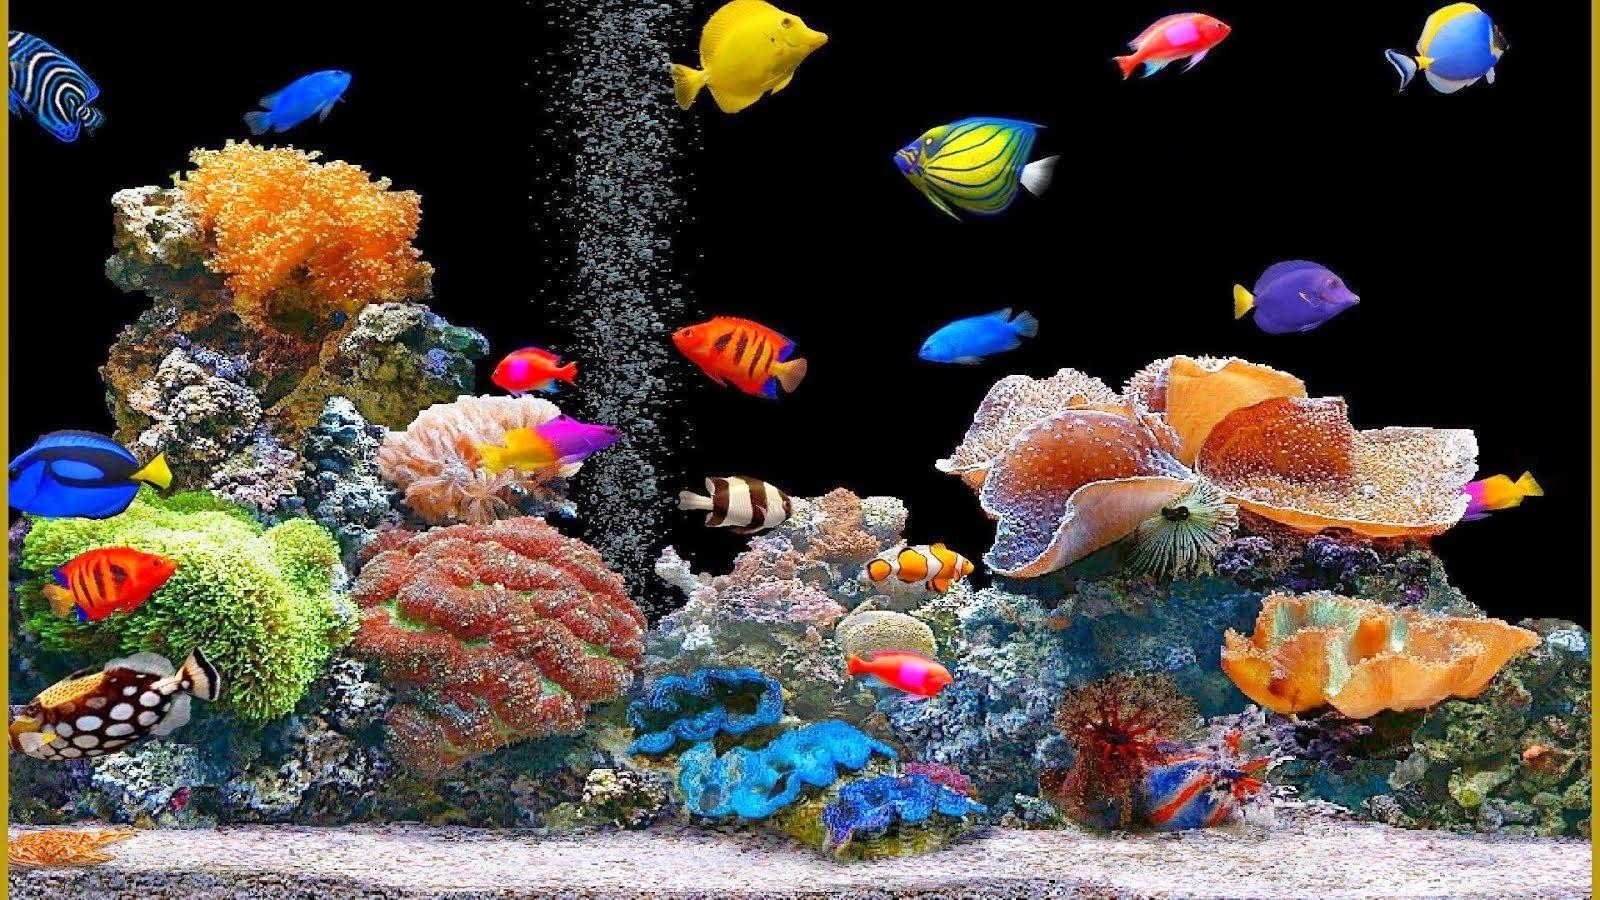 Fish tank moving desktop backgrounds download animated fish tank wallpaper in high resolution - Fish tank screensaver pc free ...